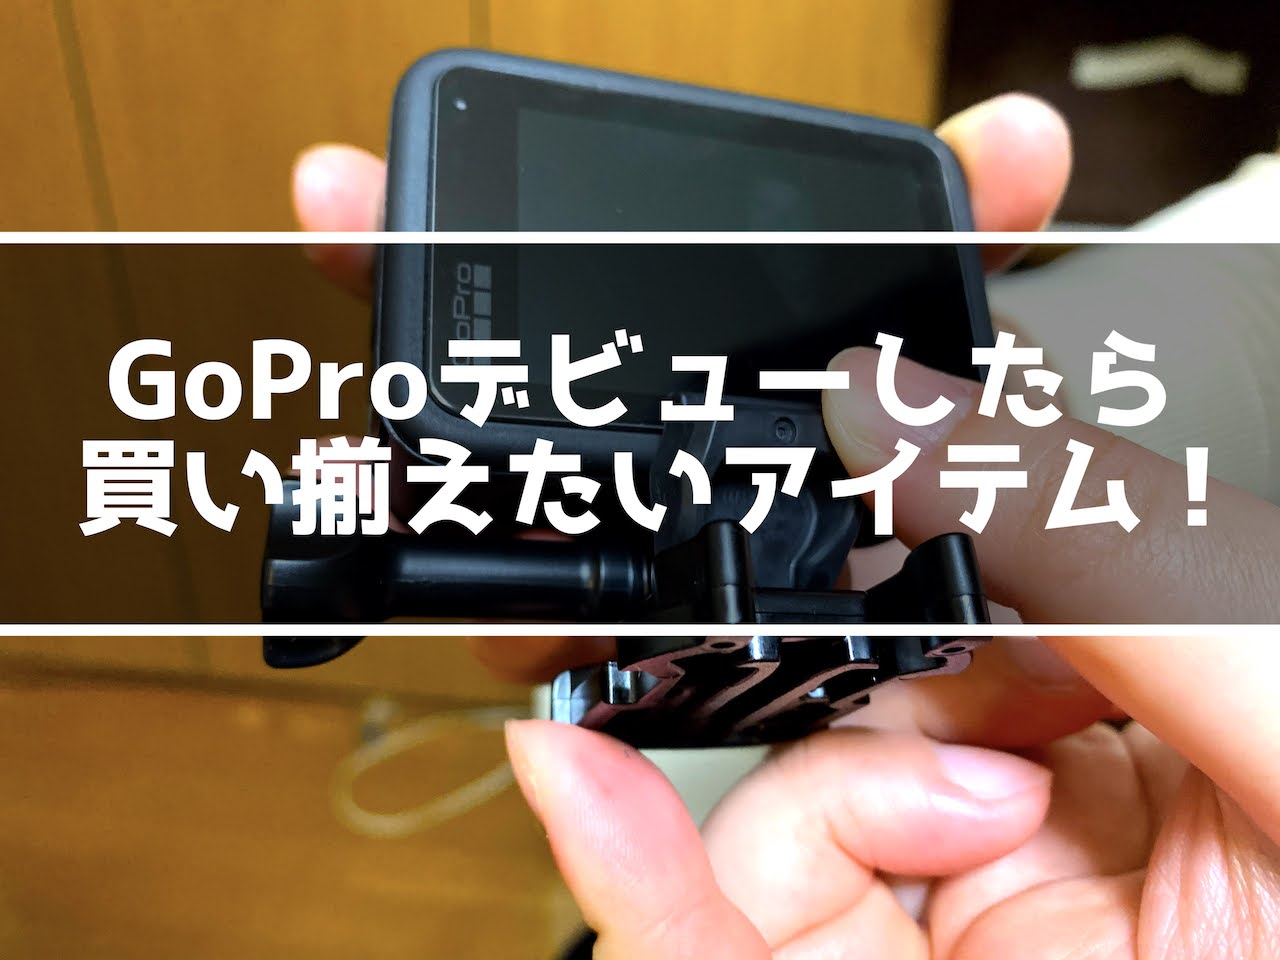 GoProと合わせて買いたいアイテム